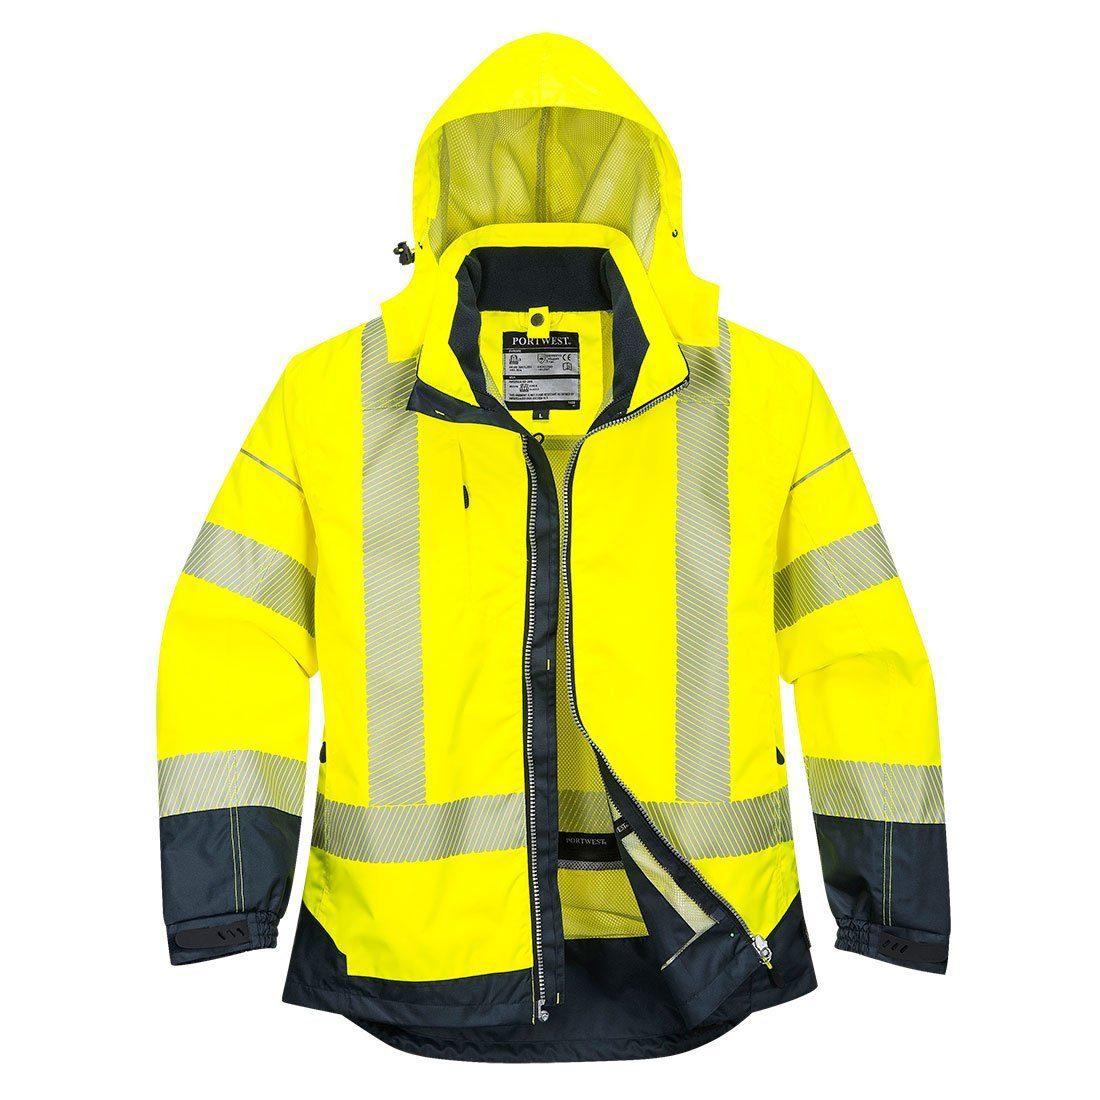 PW3 Hi-Vis Breathable Jacket